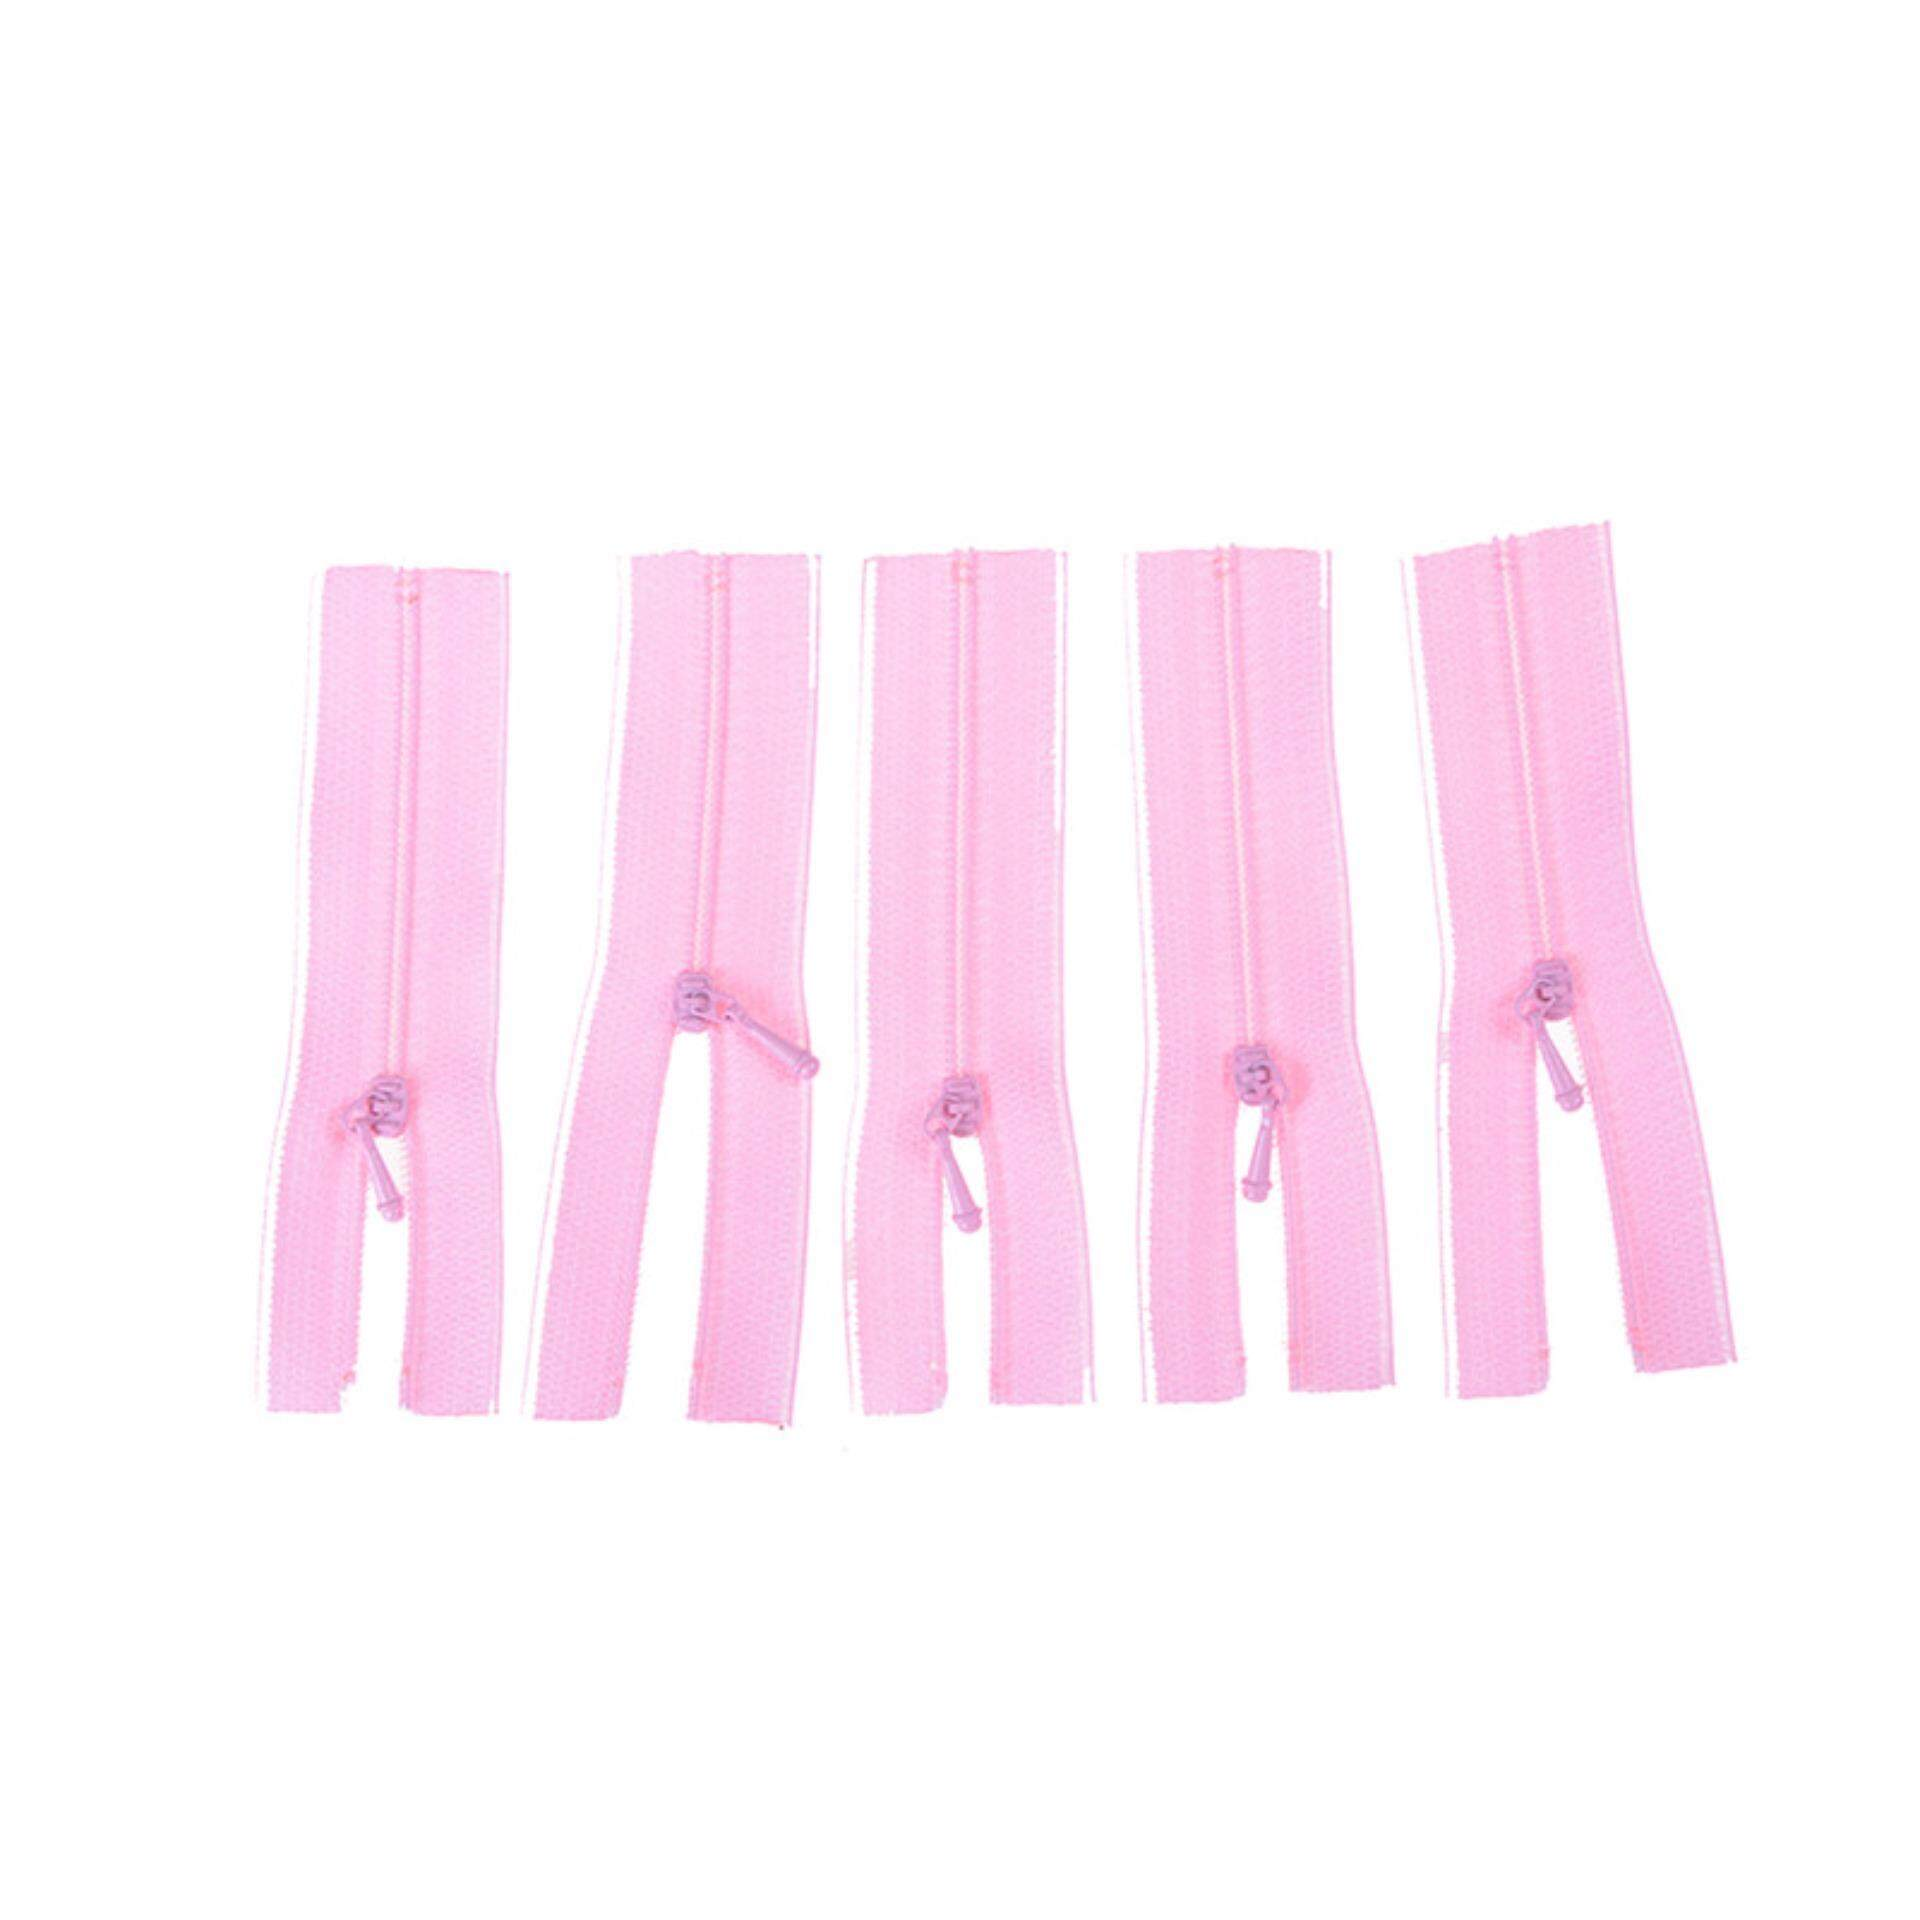 5pcs/Set Mini Zipper For Doll Dress Bags Diy Craft Sewing Accessories Tools Gift Pink